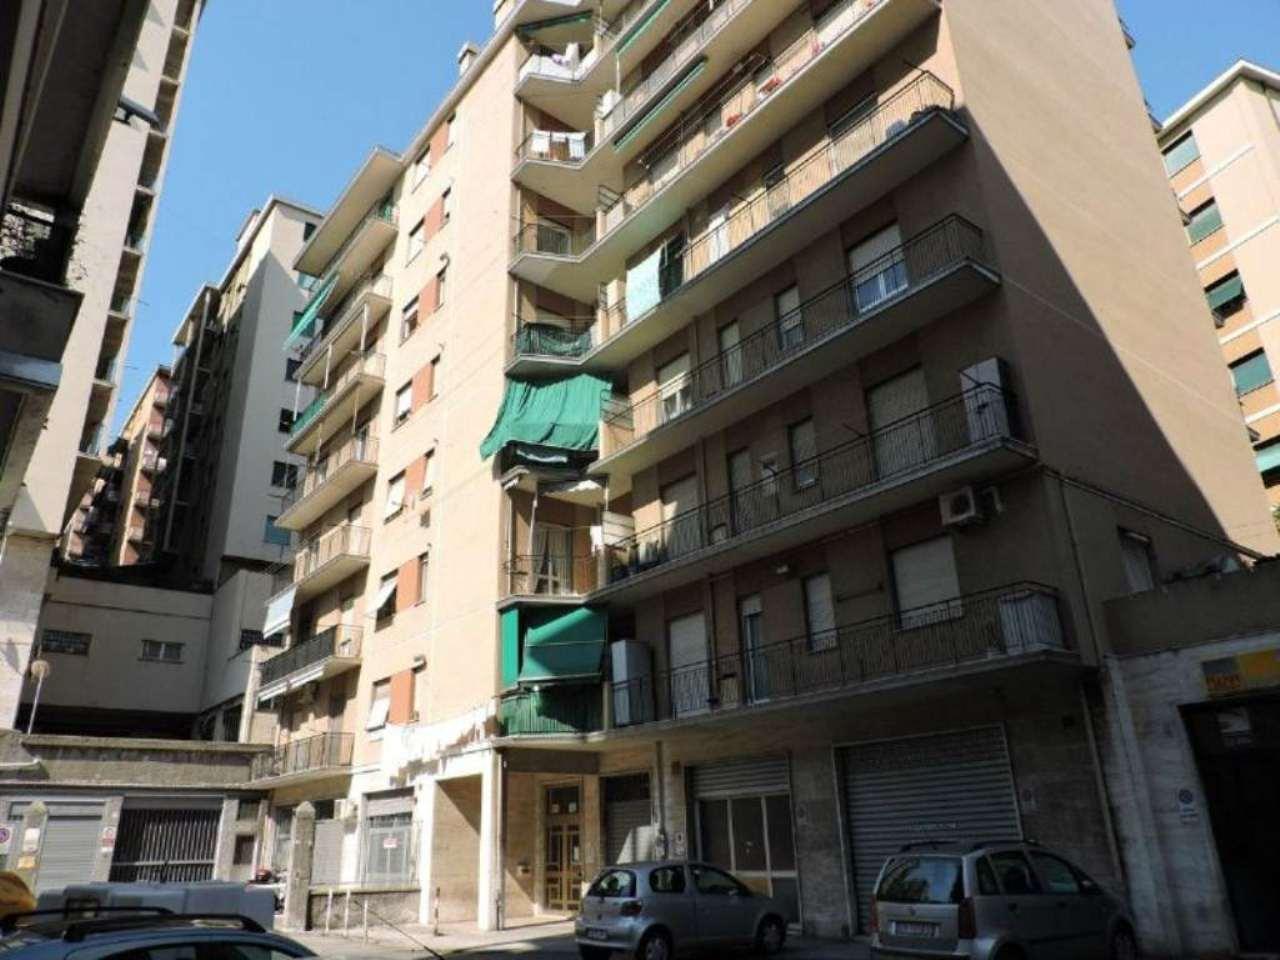 Bilocale Genova Via Manfredo Fanti 2